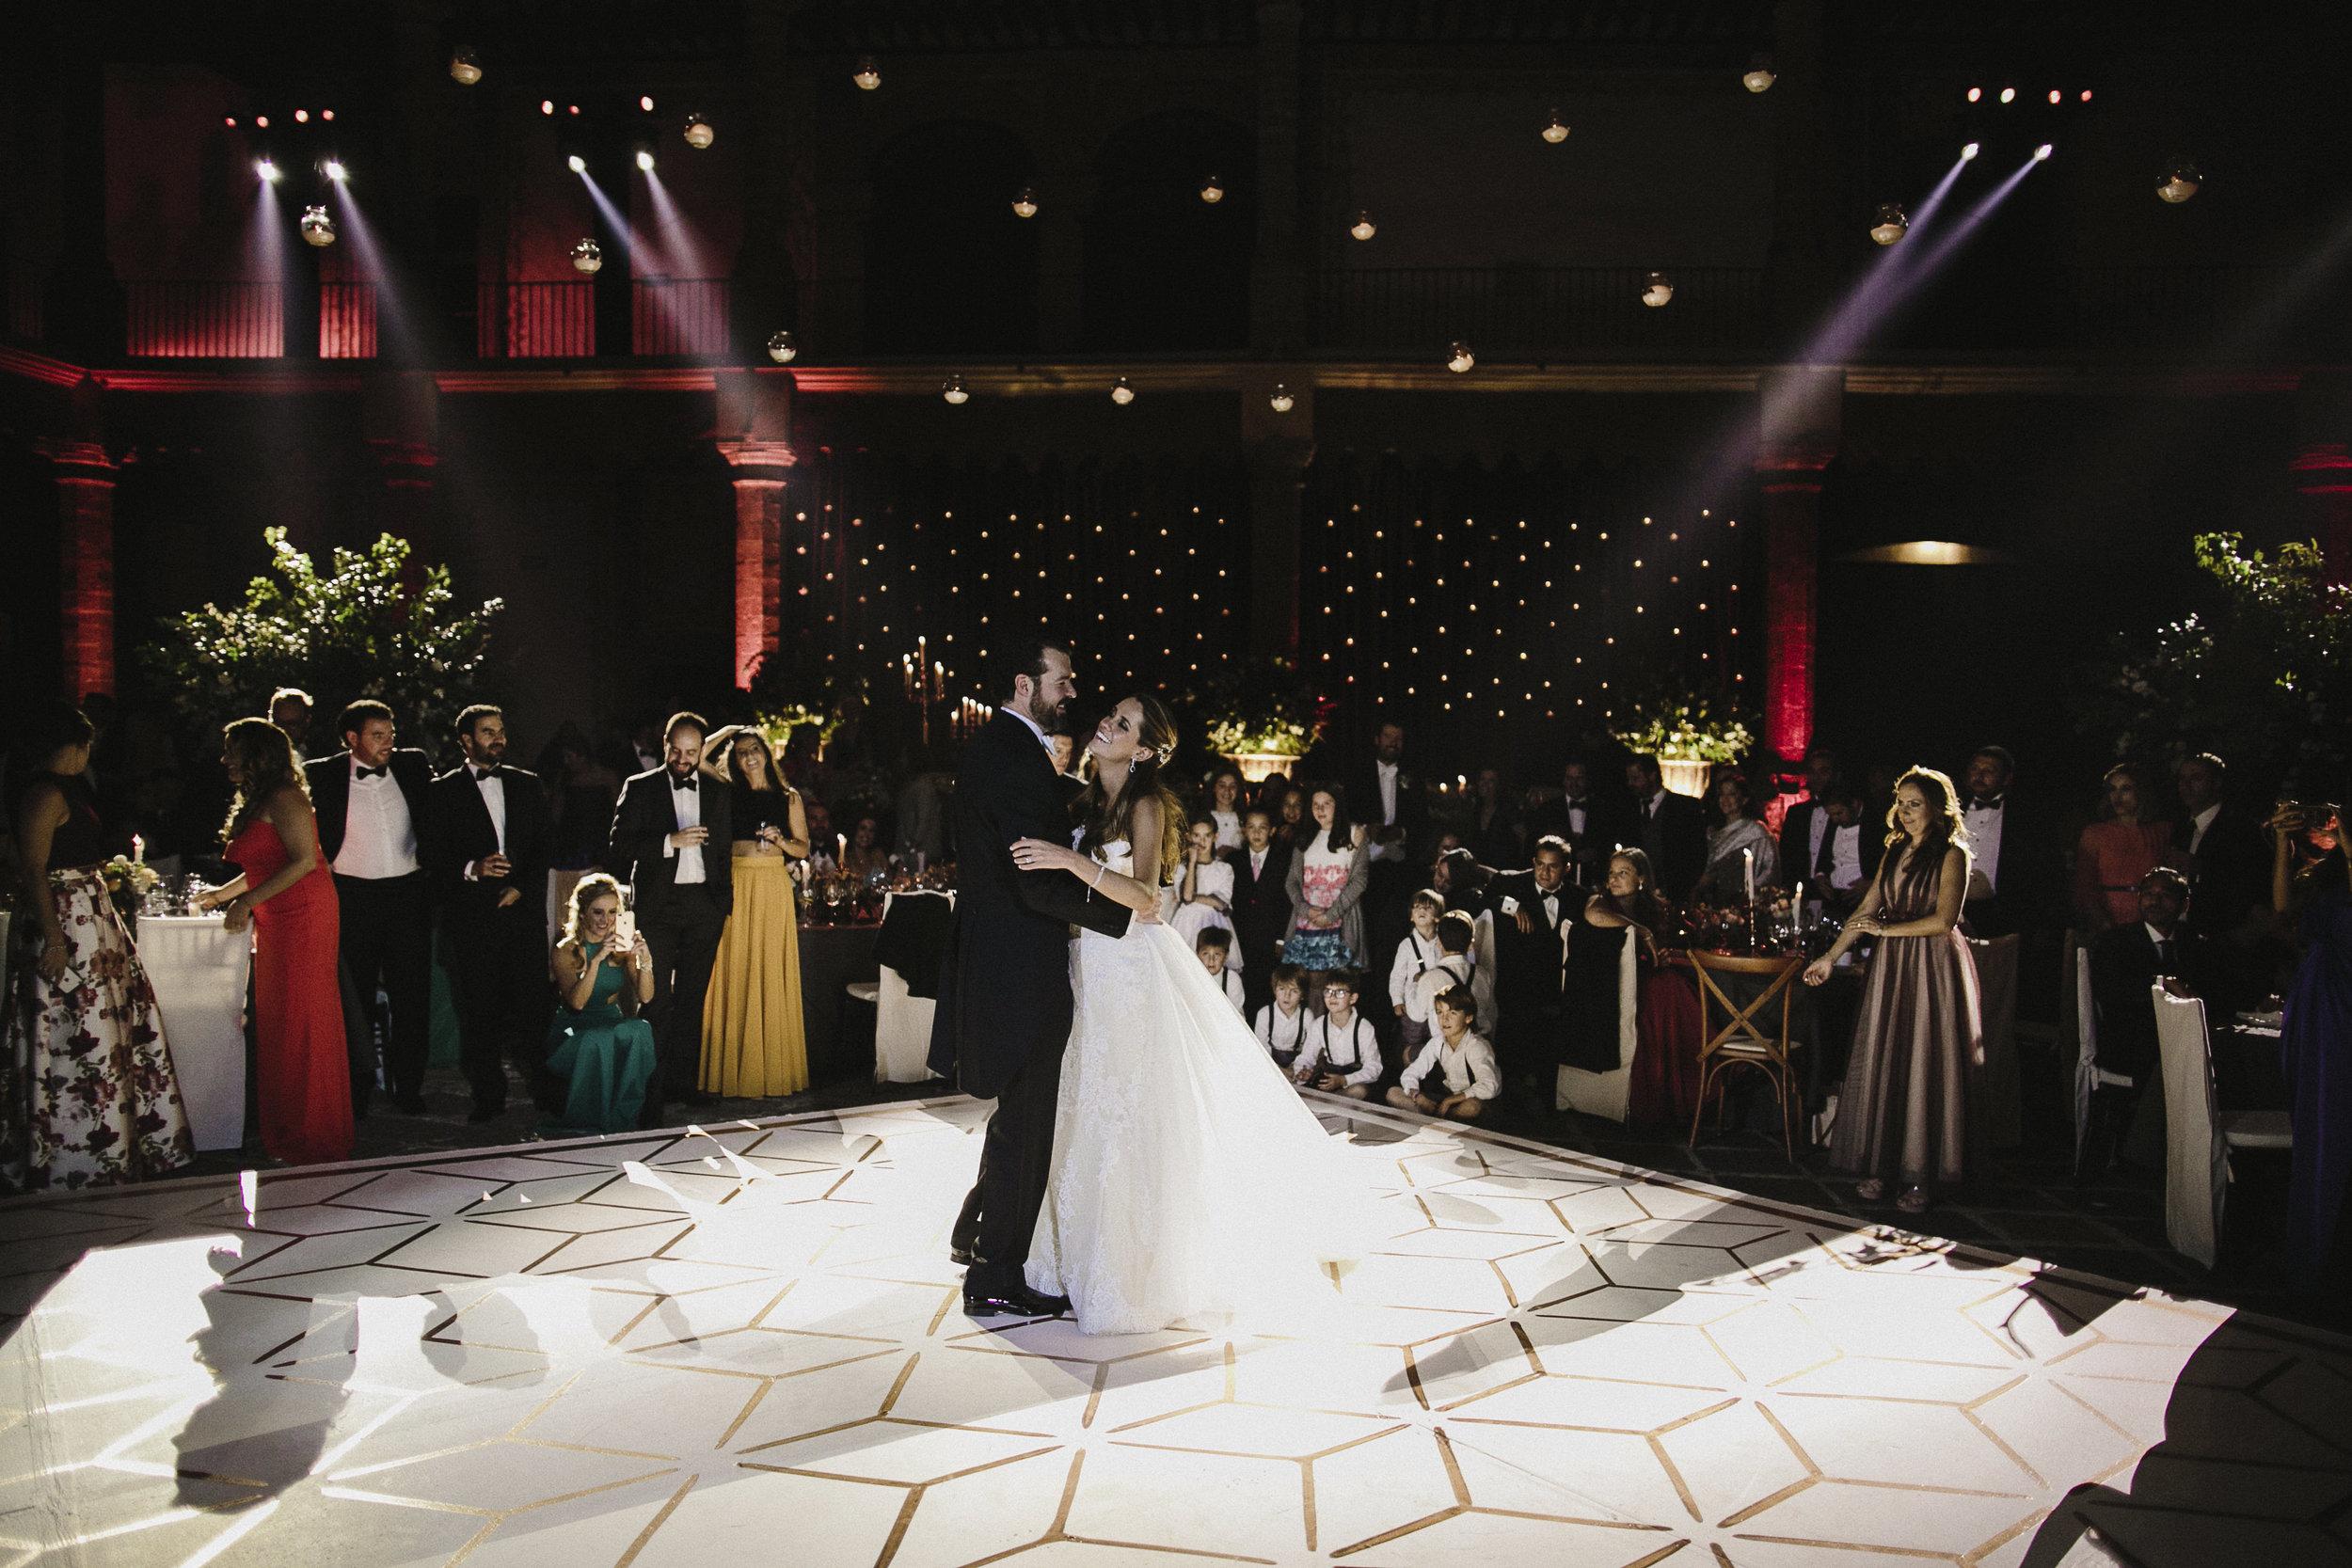 alfonso_flores_destination_wedding_photogrpahy_paola_alonso-946.JPG